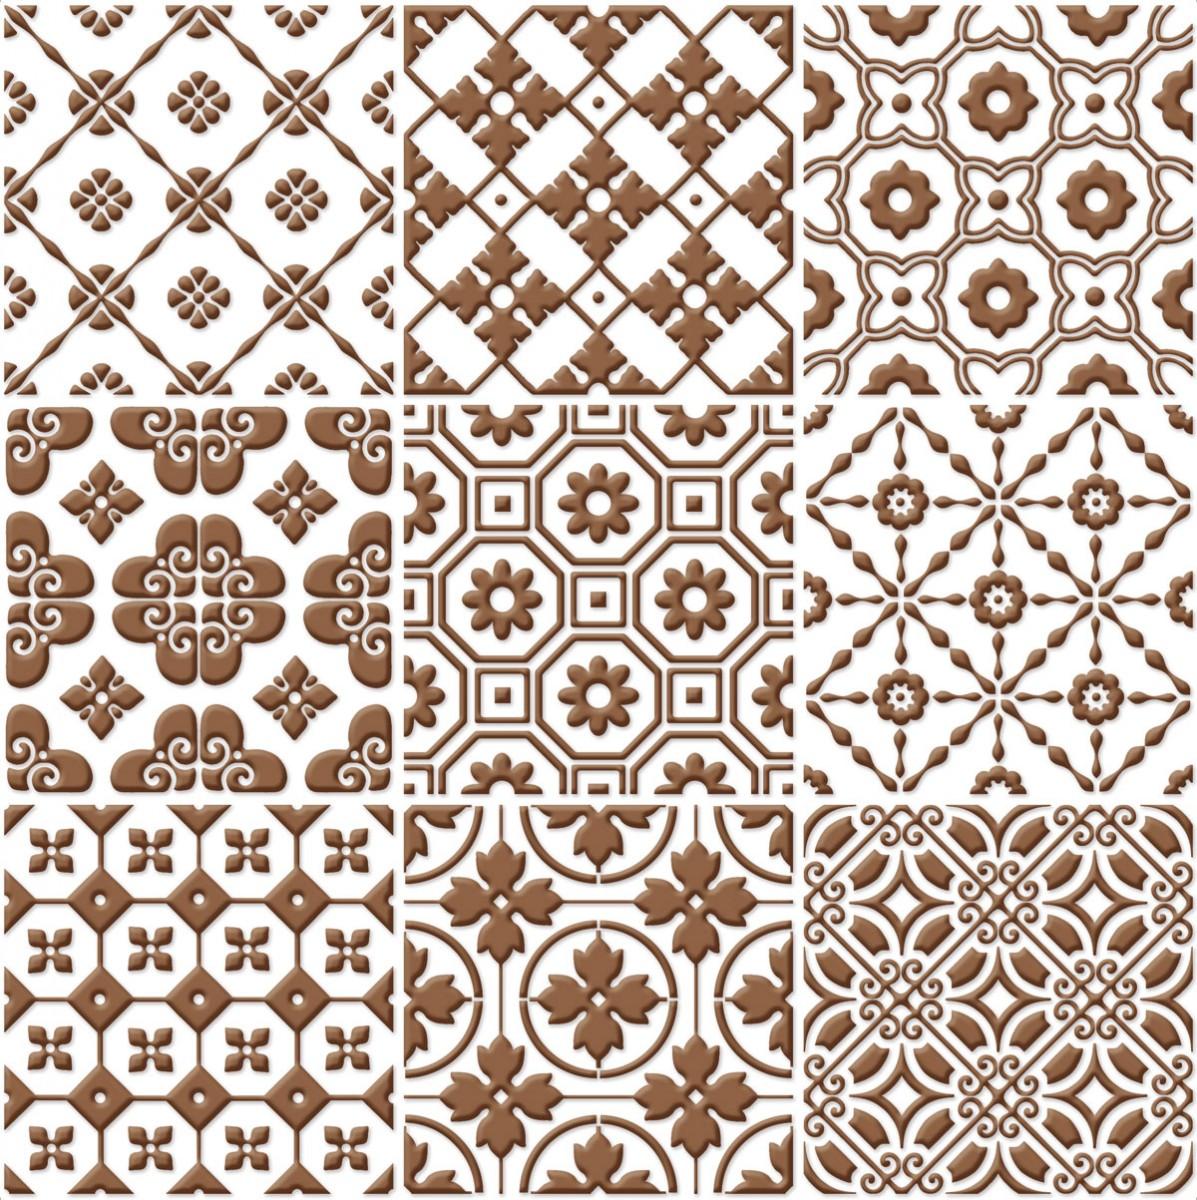 Signorino: Brown on White